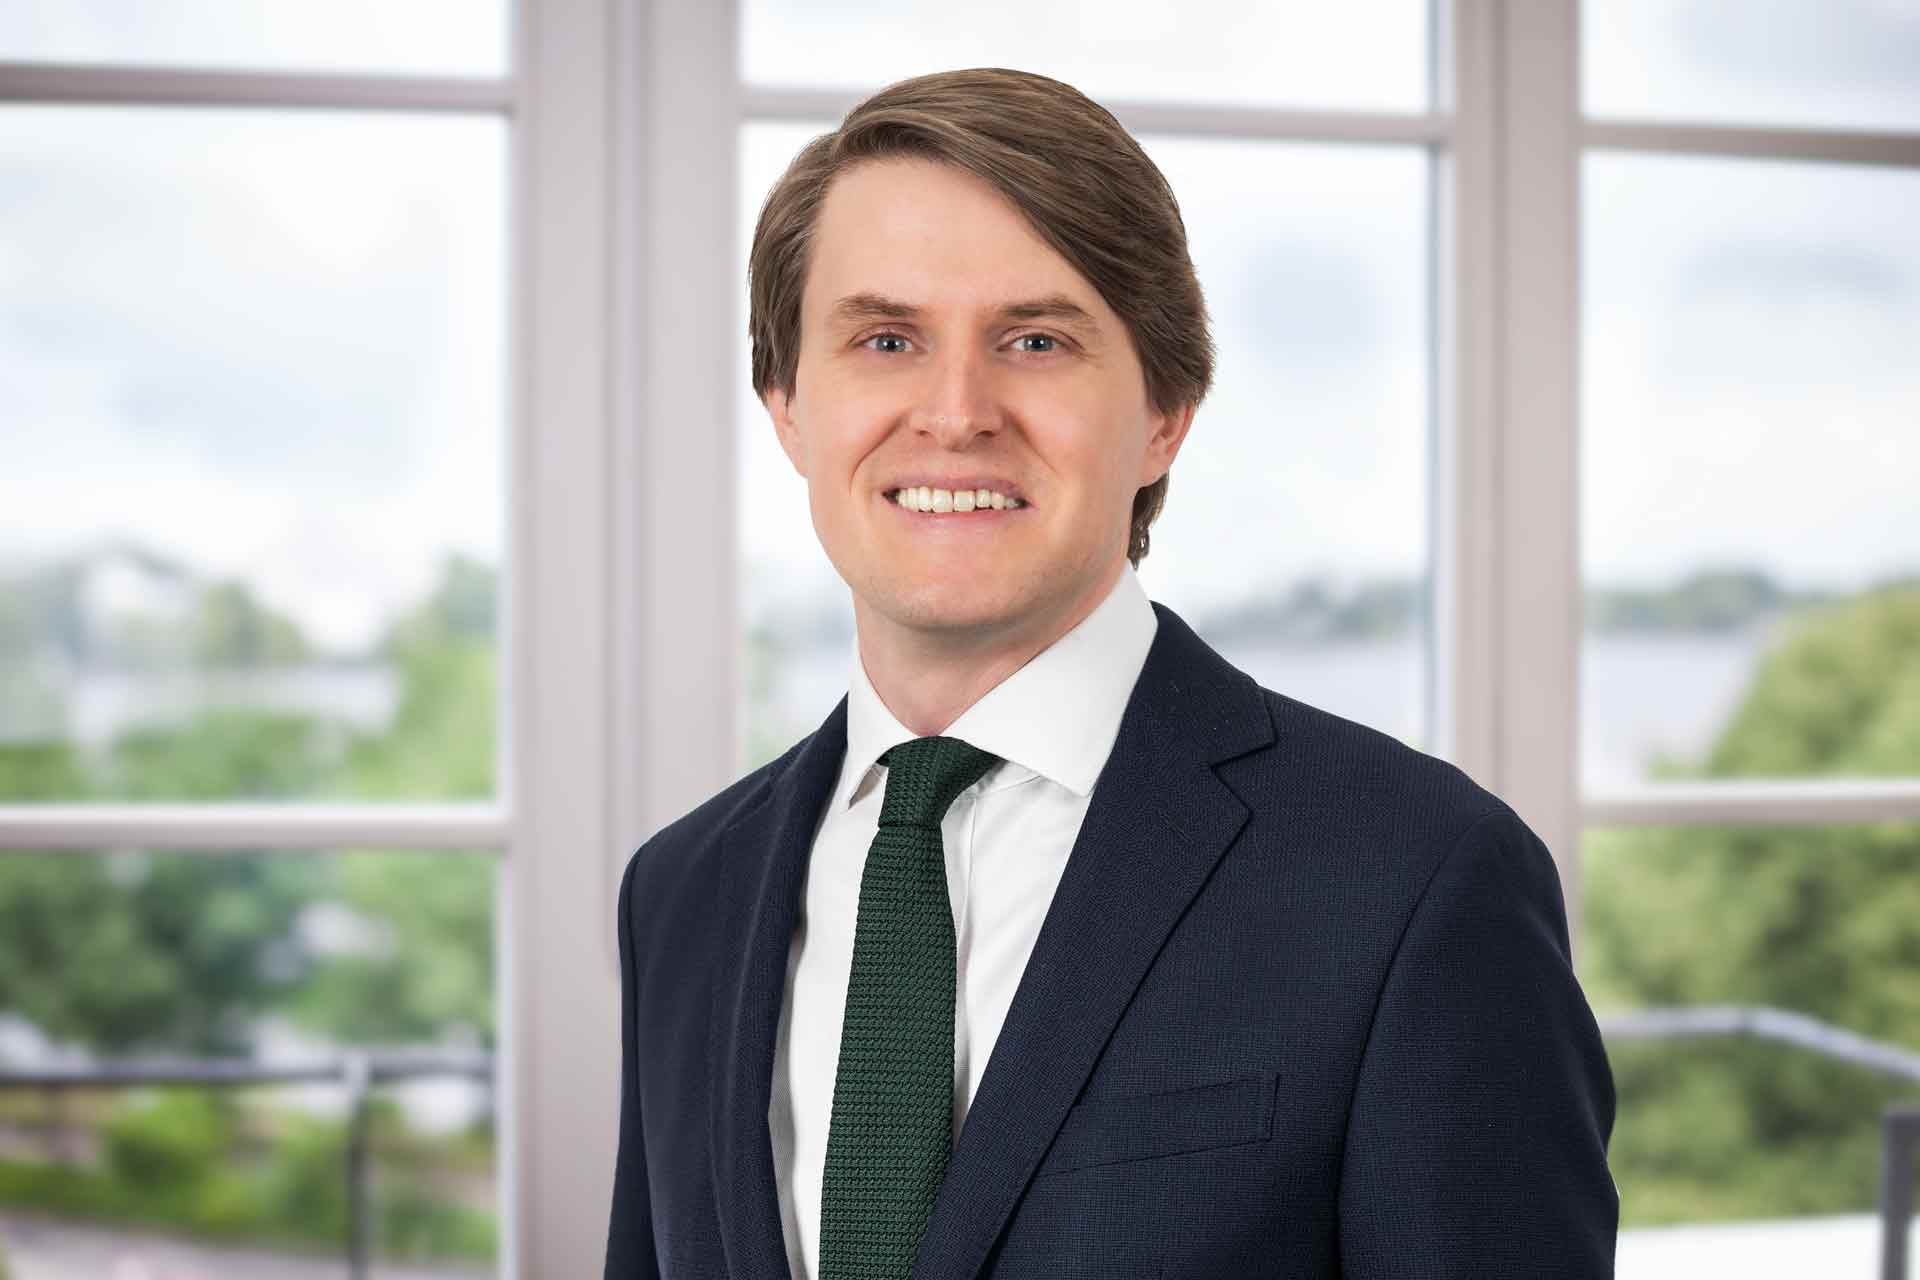 Dr.-Ing. Christoph Norrenbrock